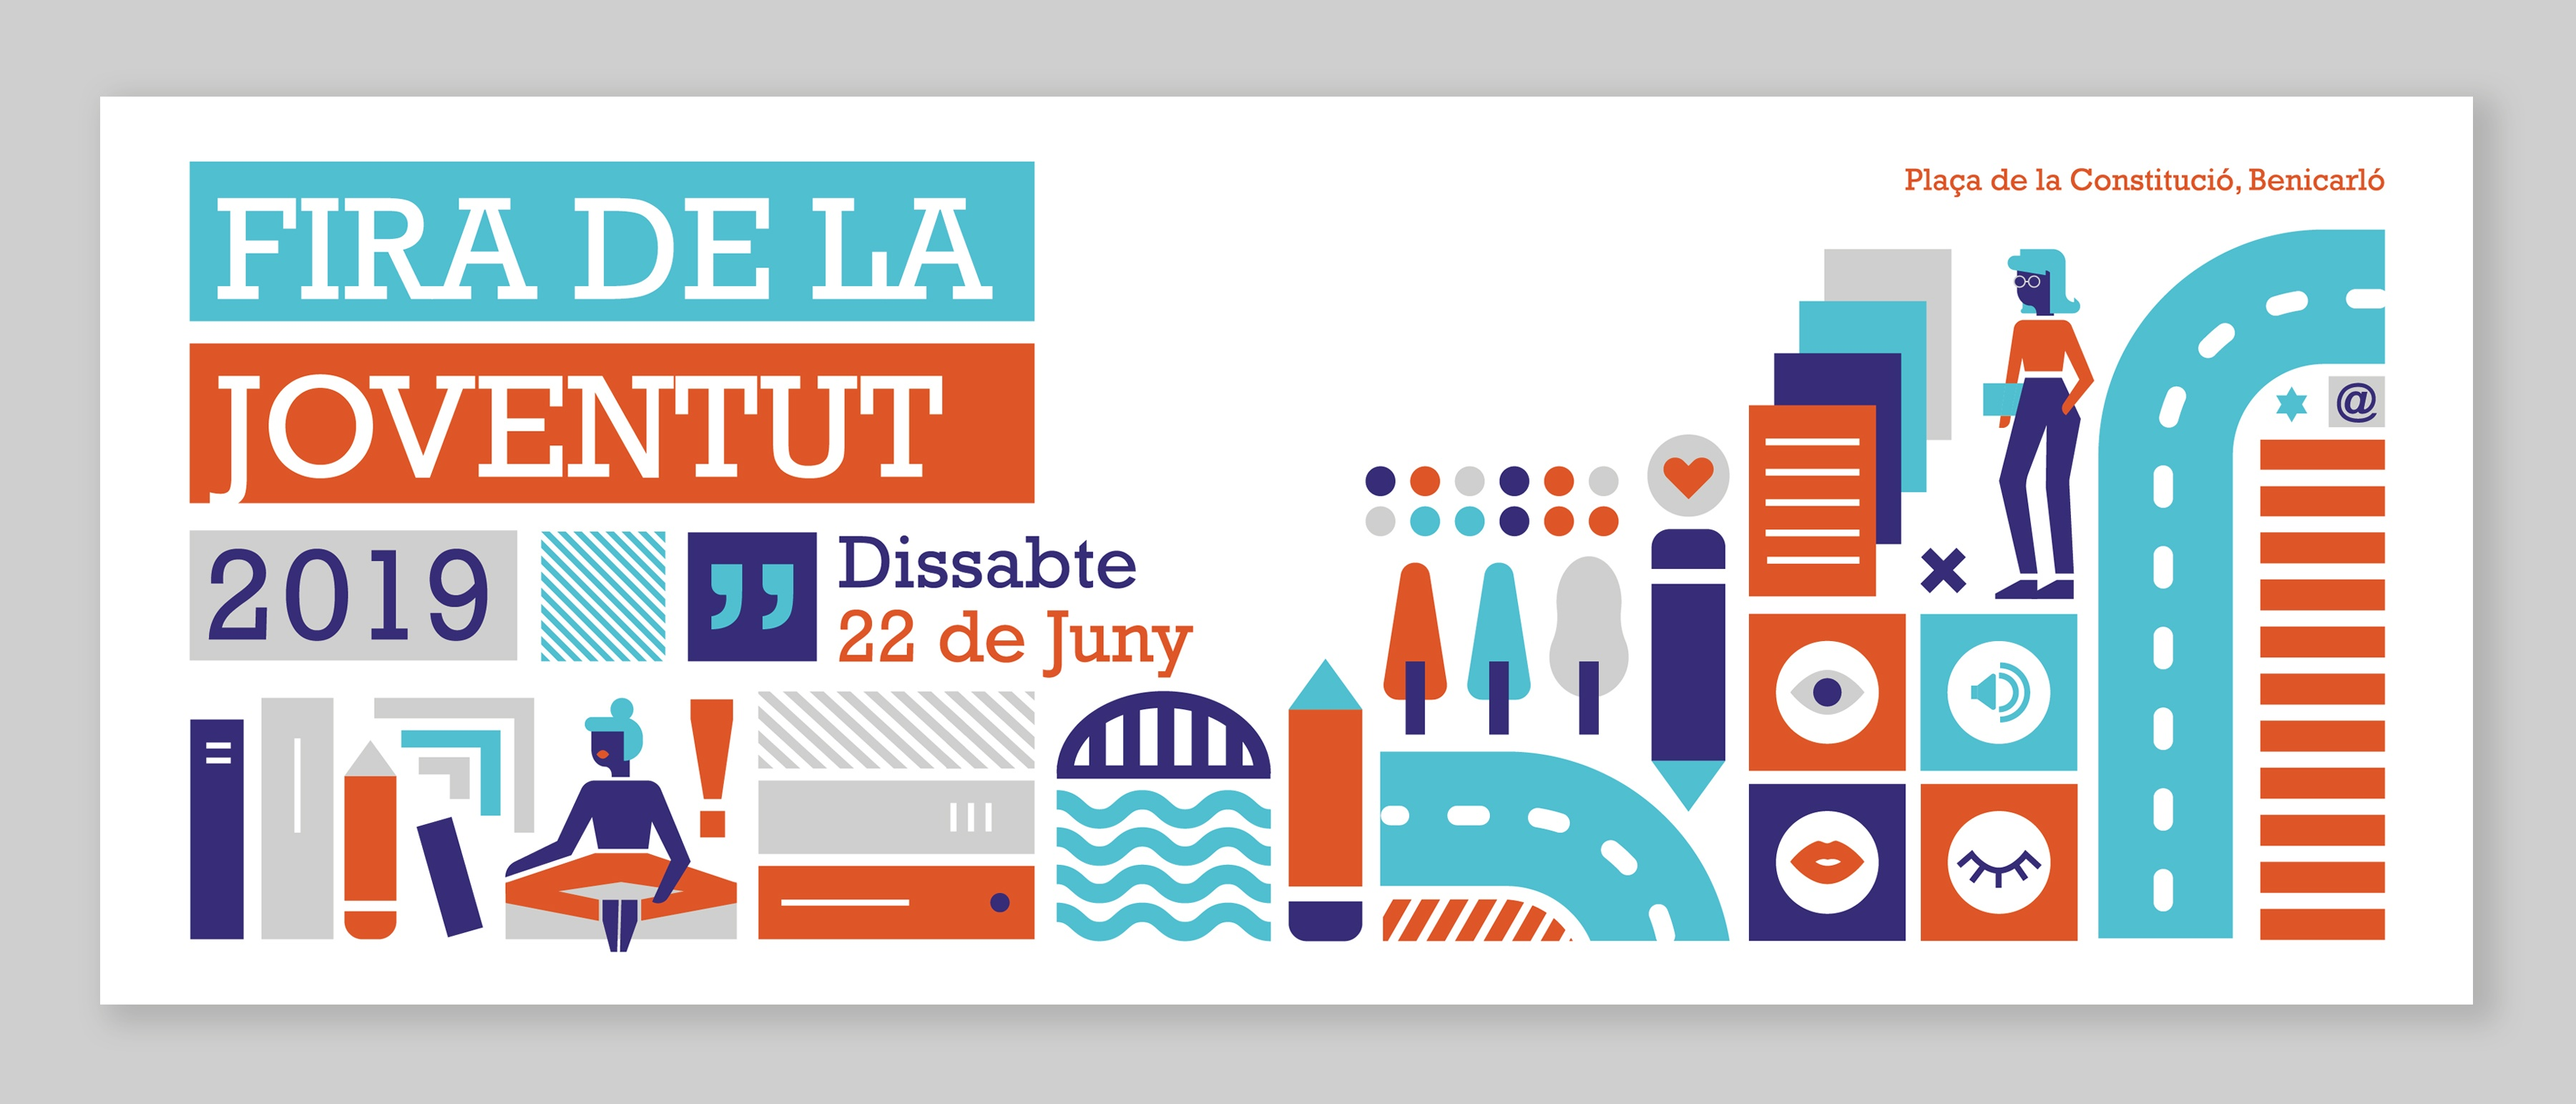 Fira de la Joventut, banner, diseño de banner para la portada de Facebook